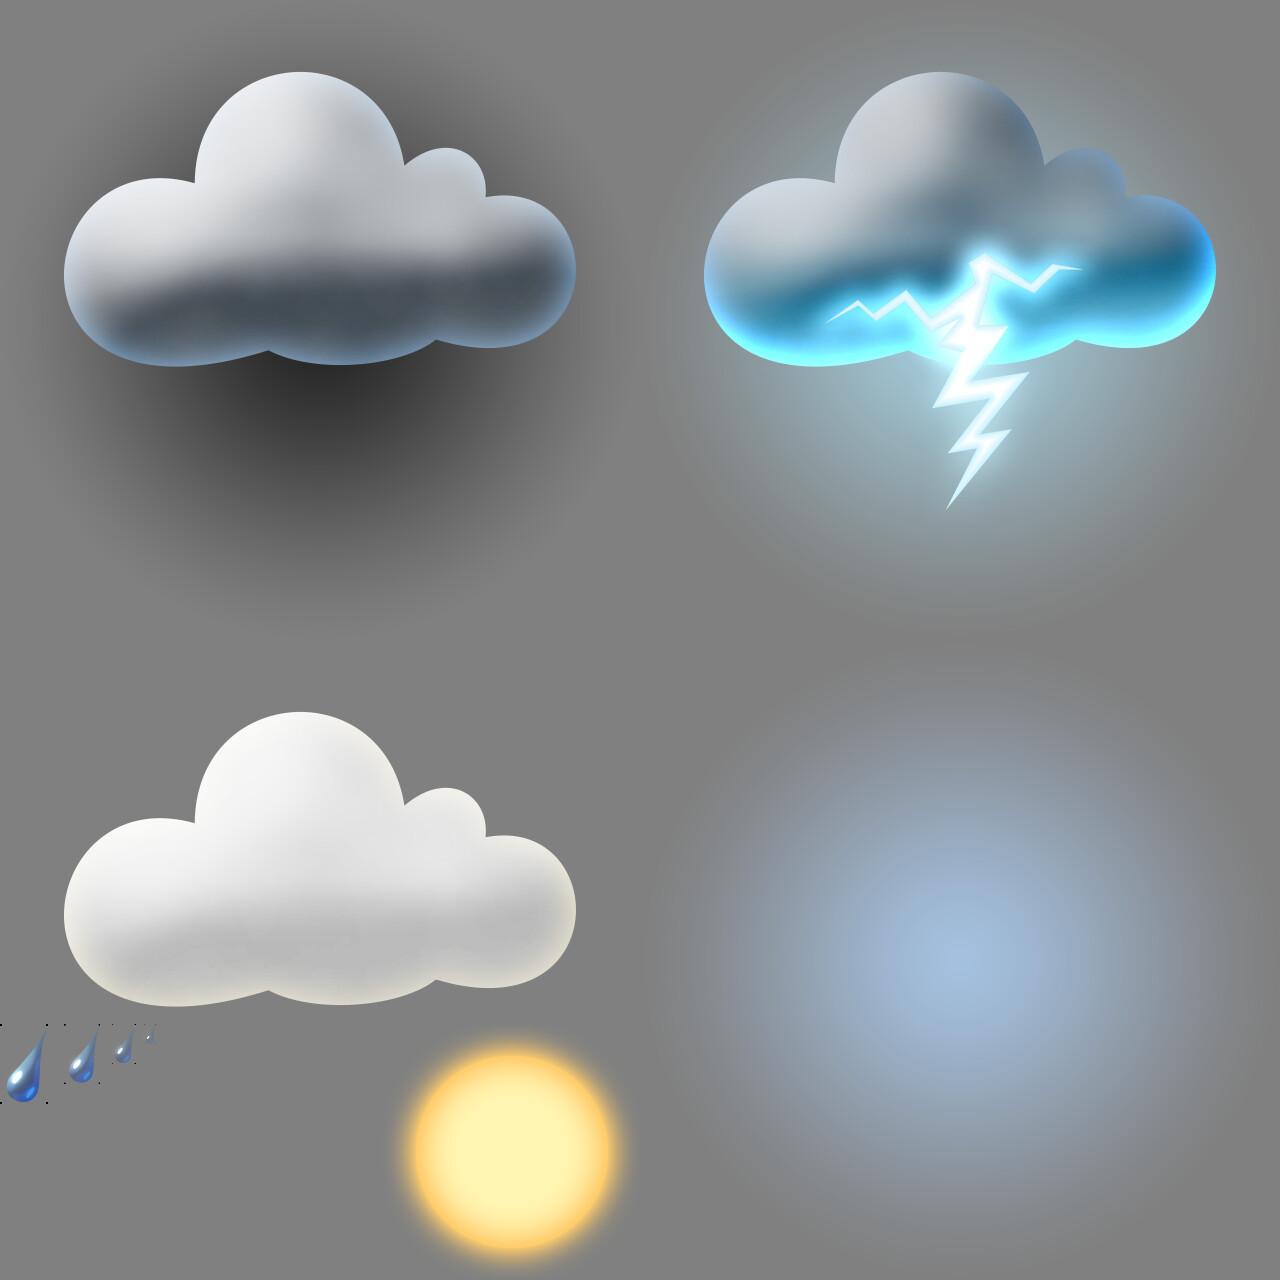 Ingame sprite sheet for weather sprites (photoshop)